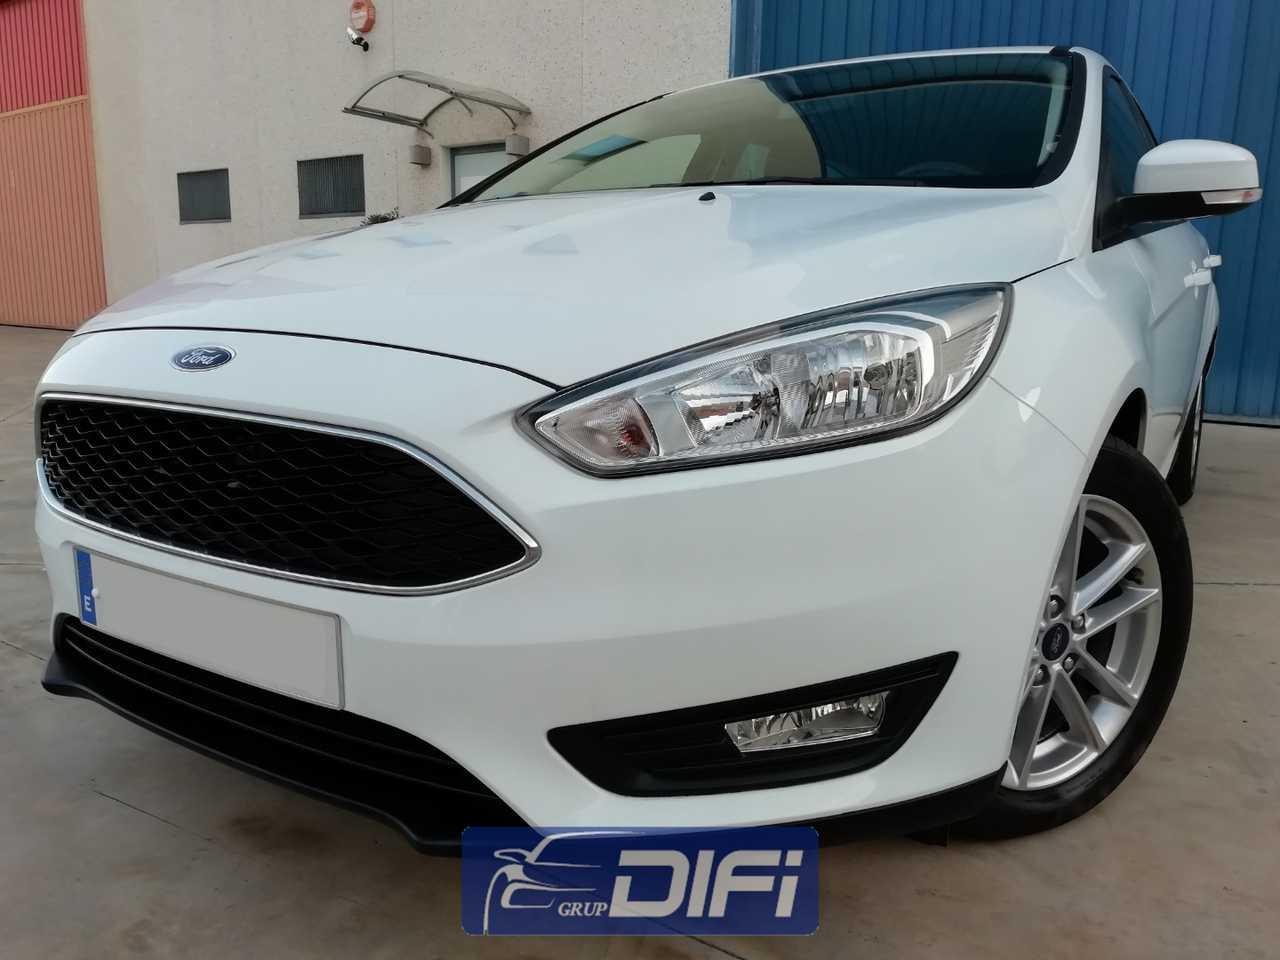 Ford Focus Wagon 1.5 TDCI 120CV BUSINESS   - Foto 1